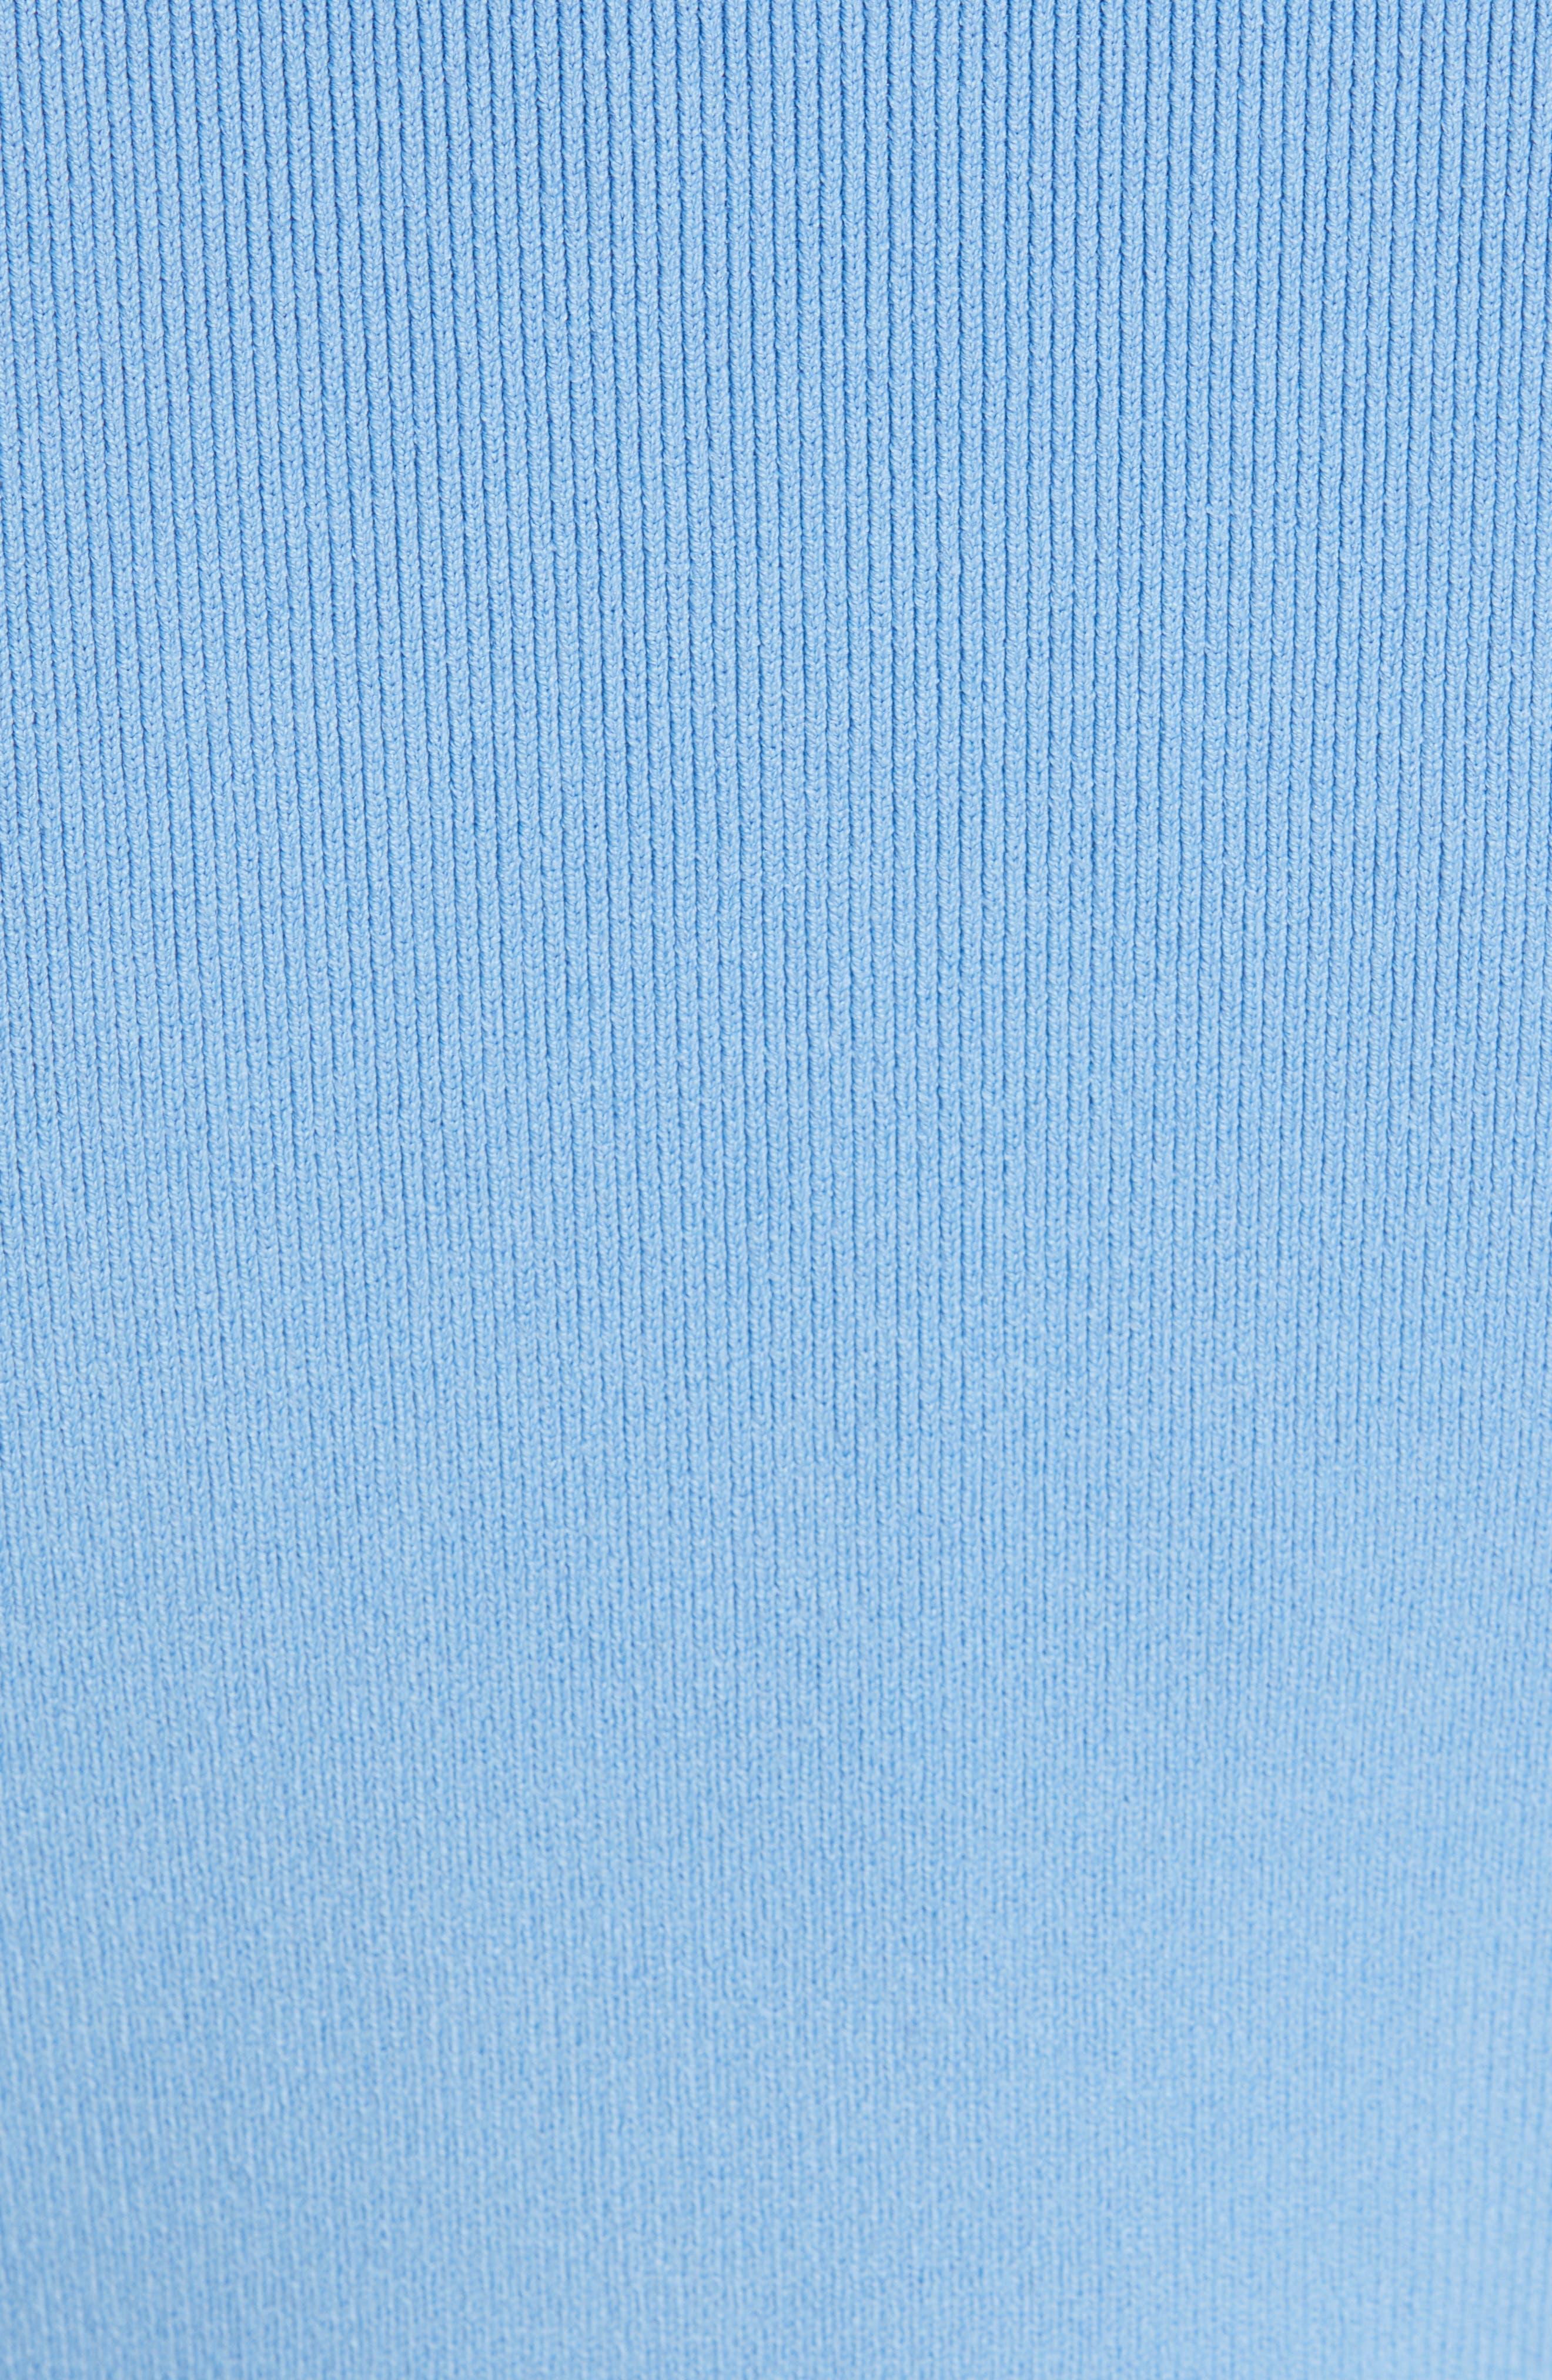 Knit Bolero,                             Alternate thumbnail 6, color,                             SKY